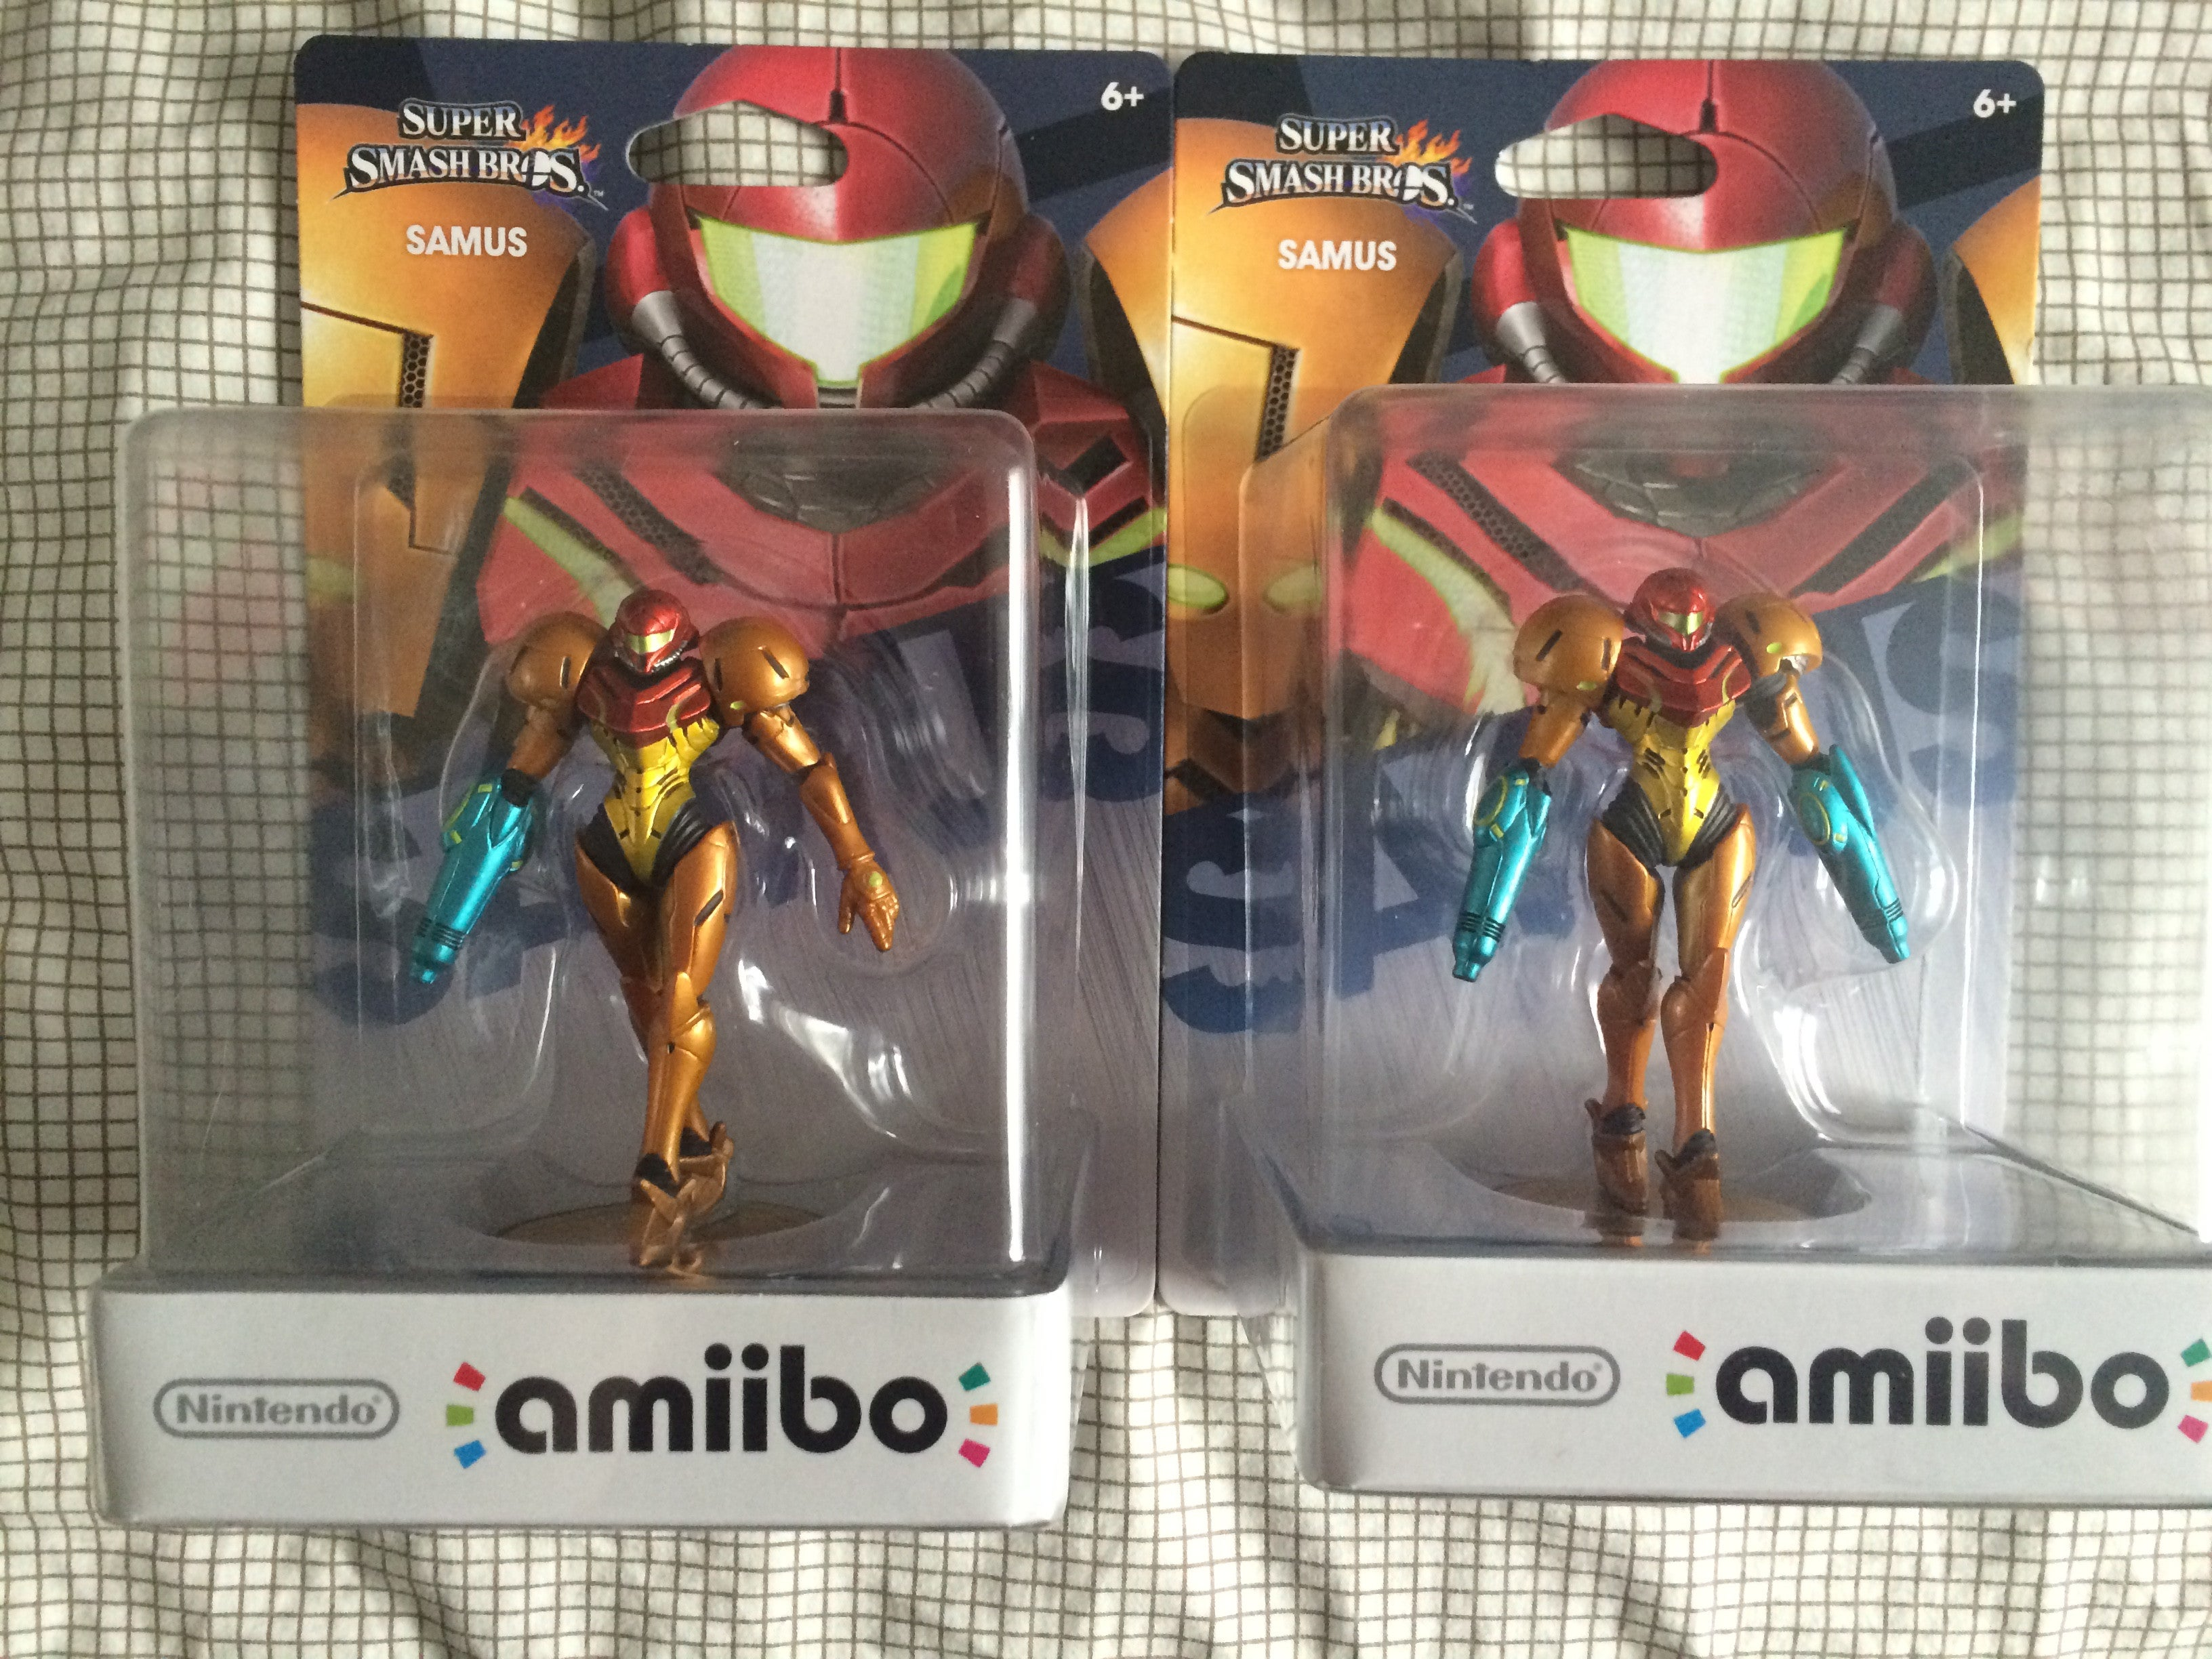 Defective Samus Amiibo? More Like Perfected Samus Amiibo